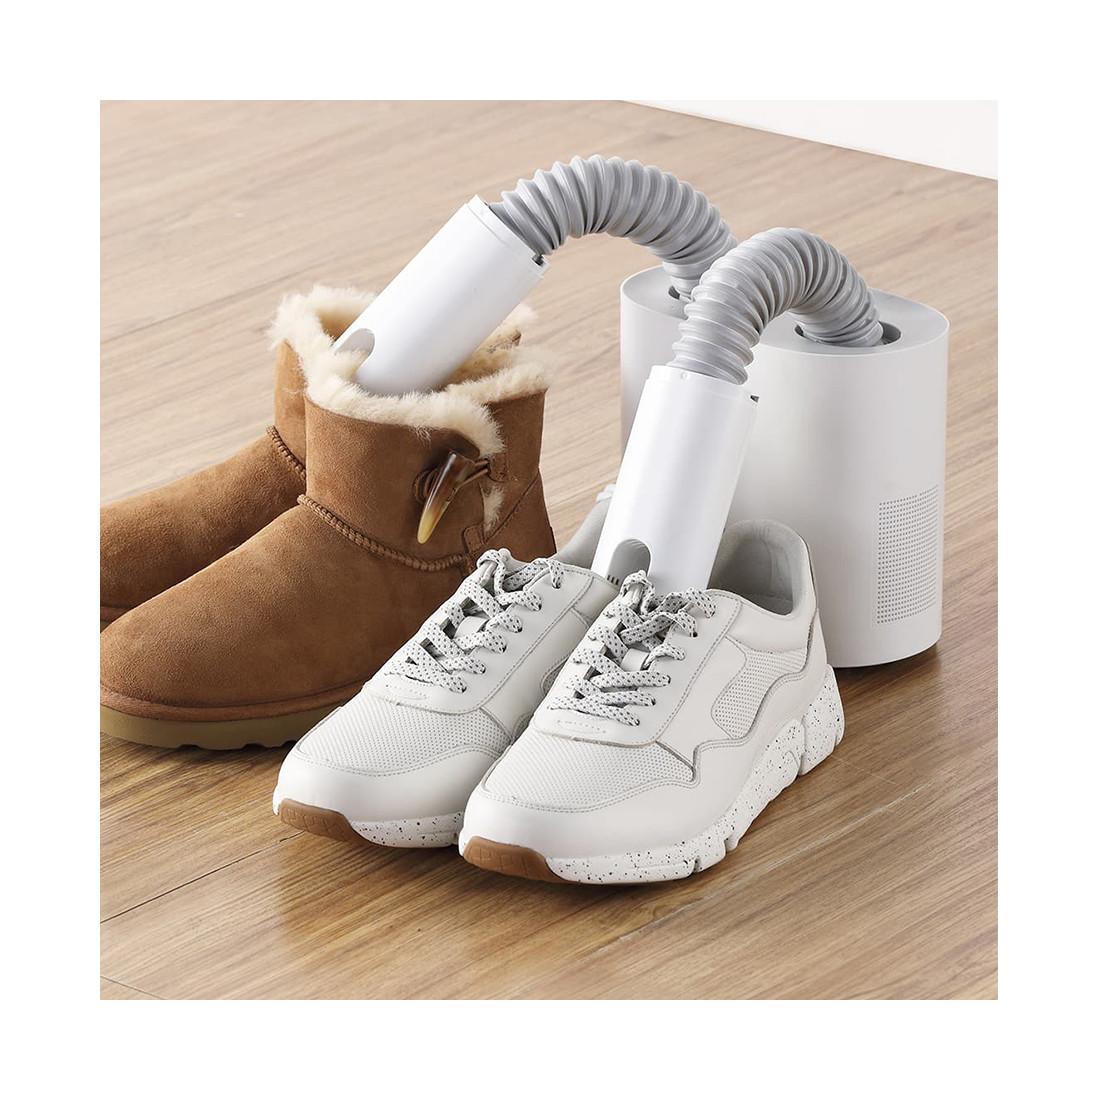 Сушилка для обуви Deerma HX10 Shoe dryer